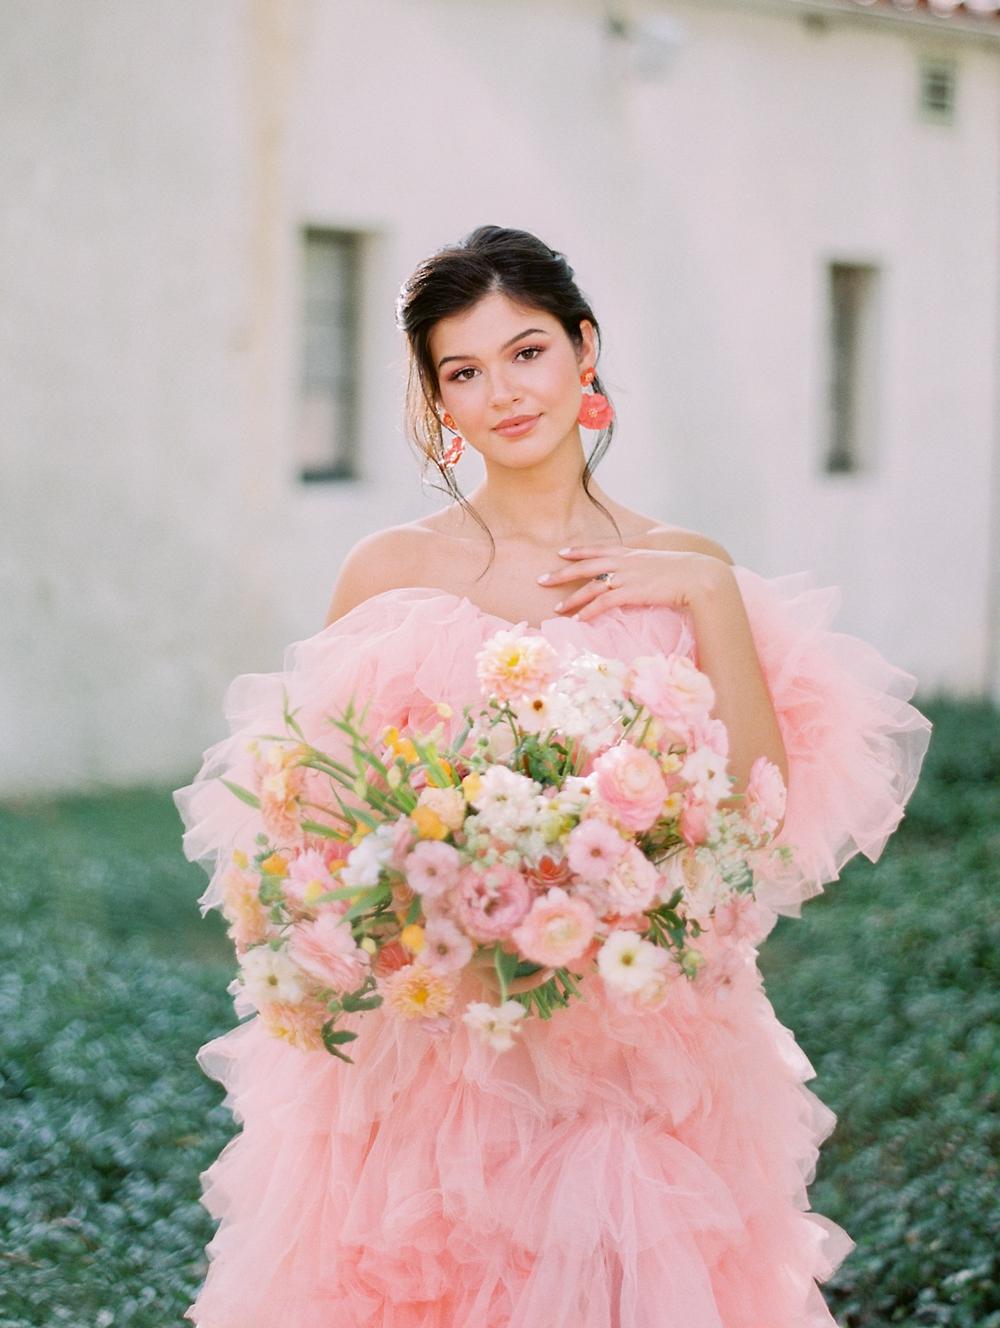 kristin-la-voie-photography-DALLAS-WEDDING-BRIDAL-PHOTOGRAPHER-BOTANICAL-ARBORETUM-93